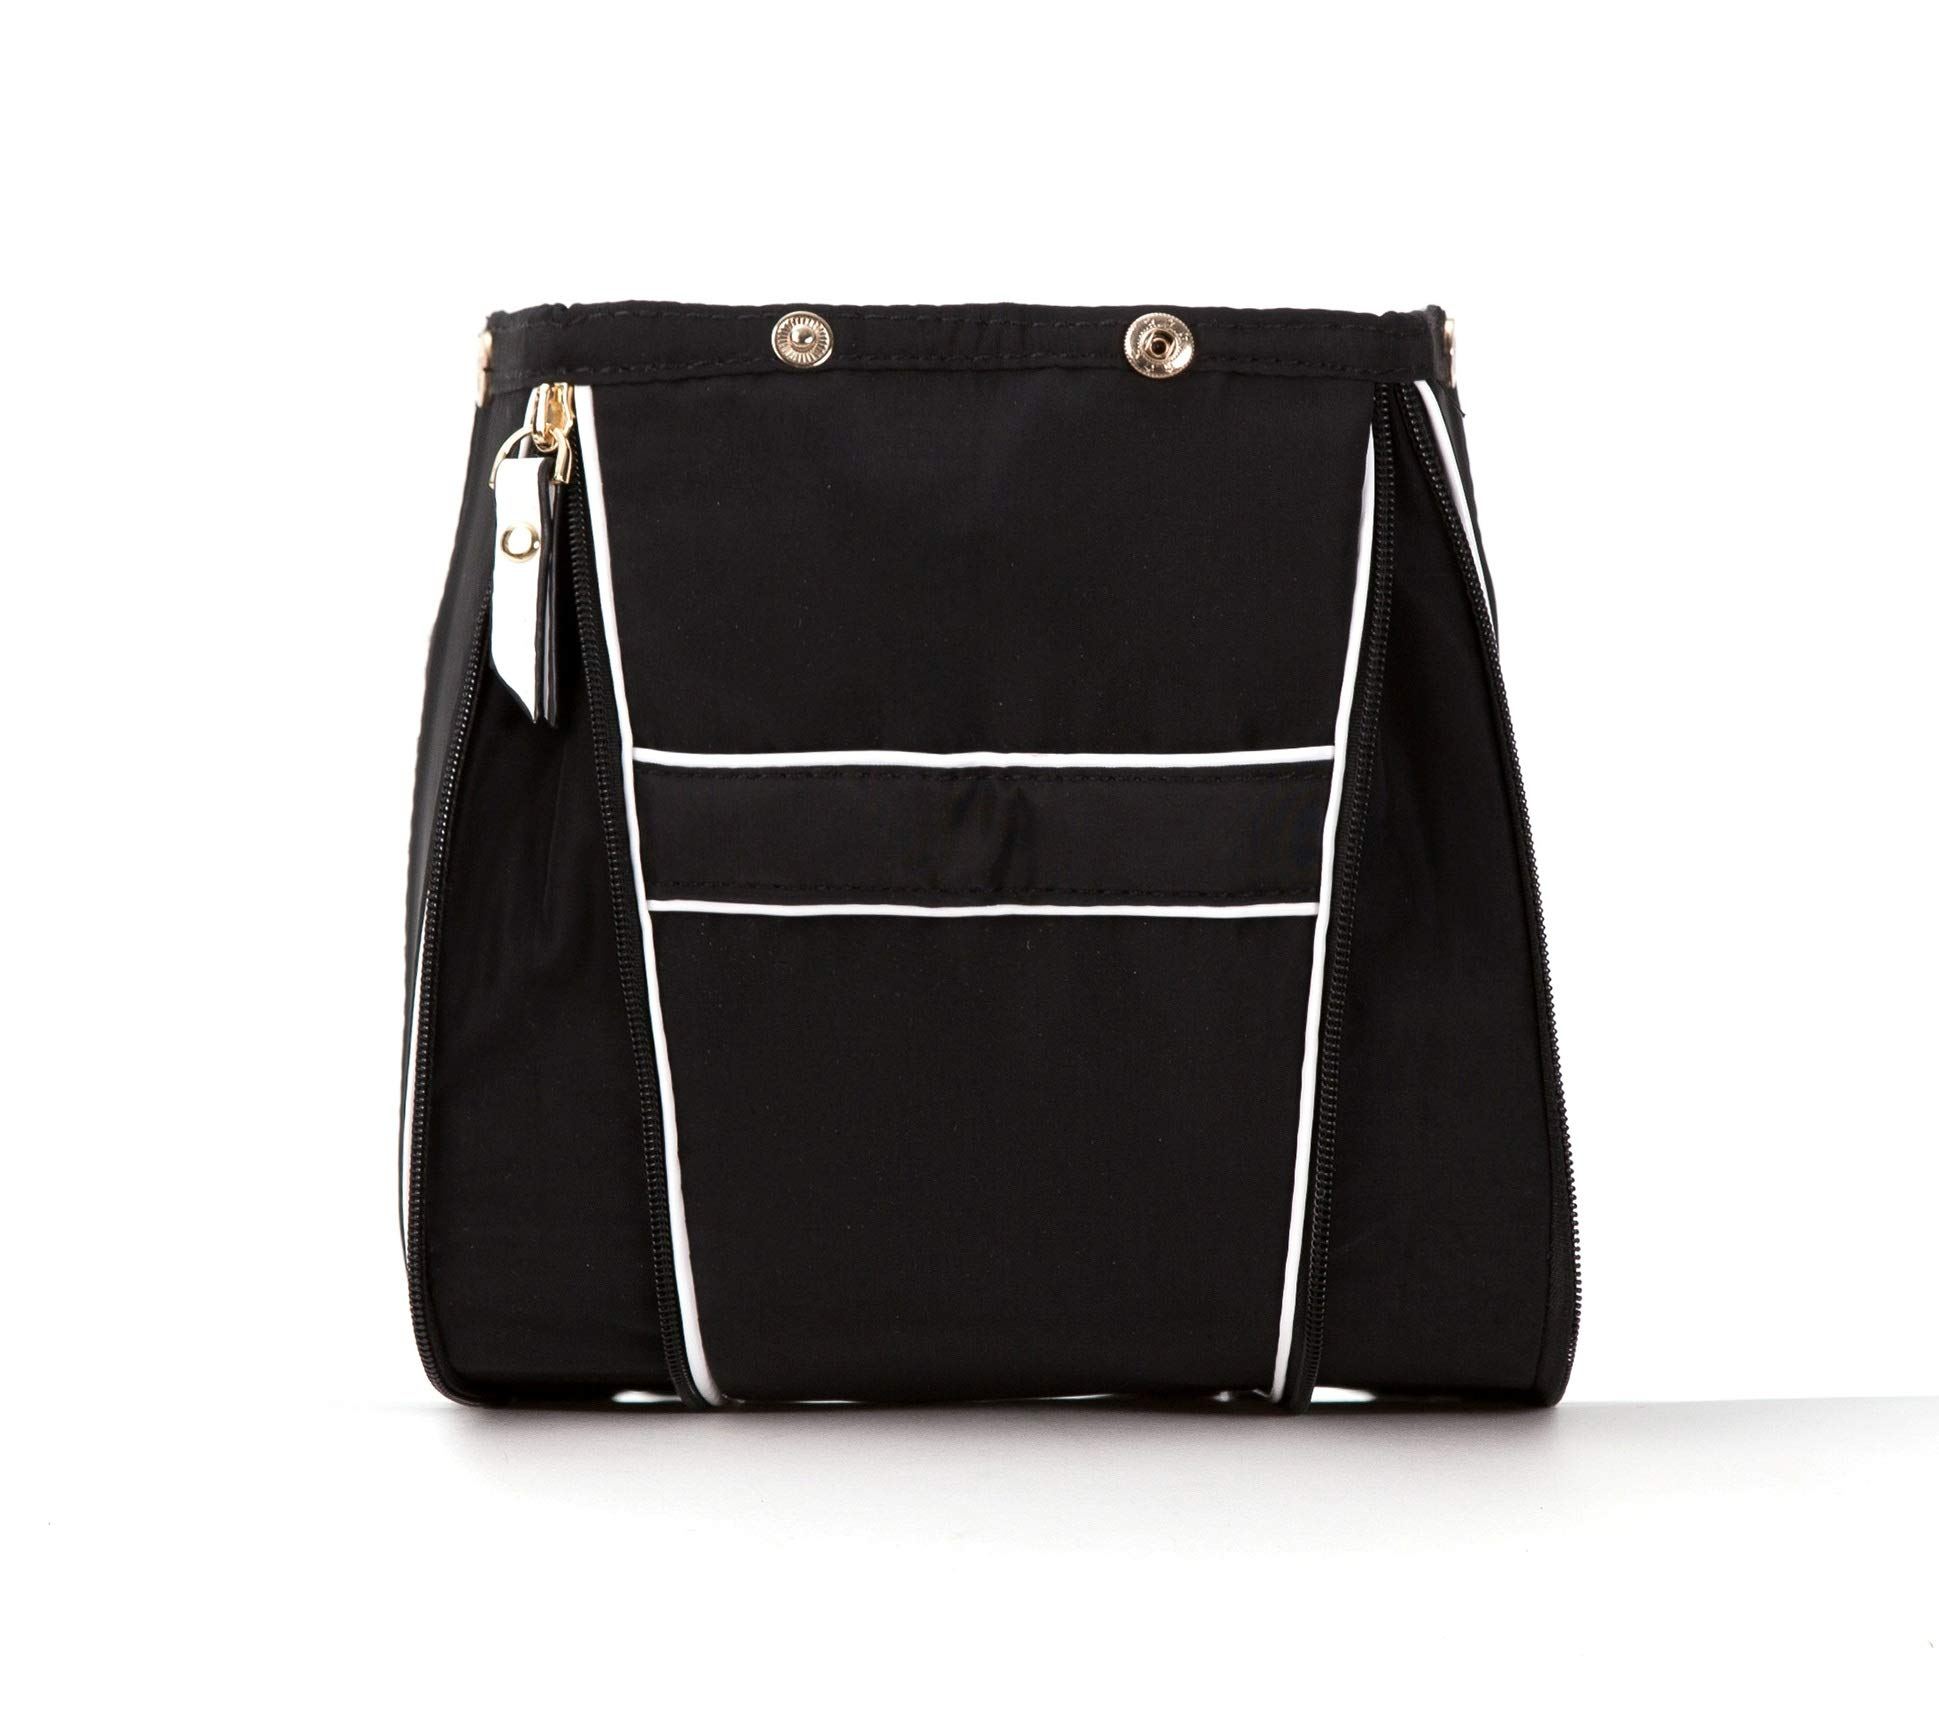 PurseN Handbag Organizer Insert (Small, Blanc Noir) by PurseN (Image #4)